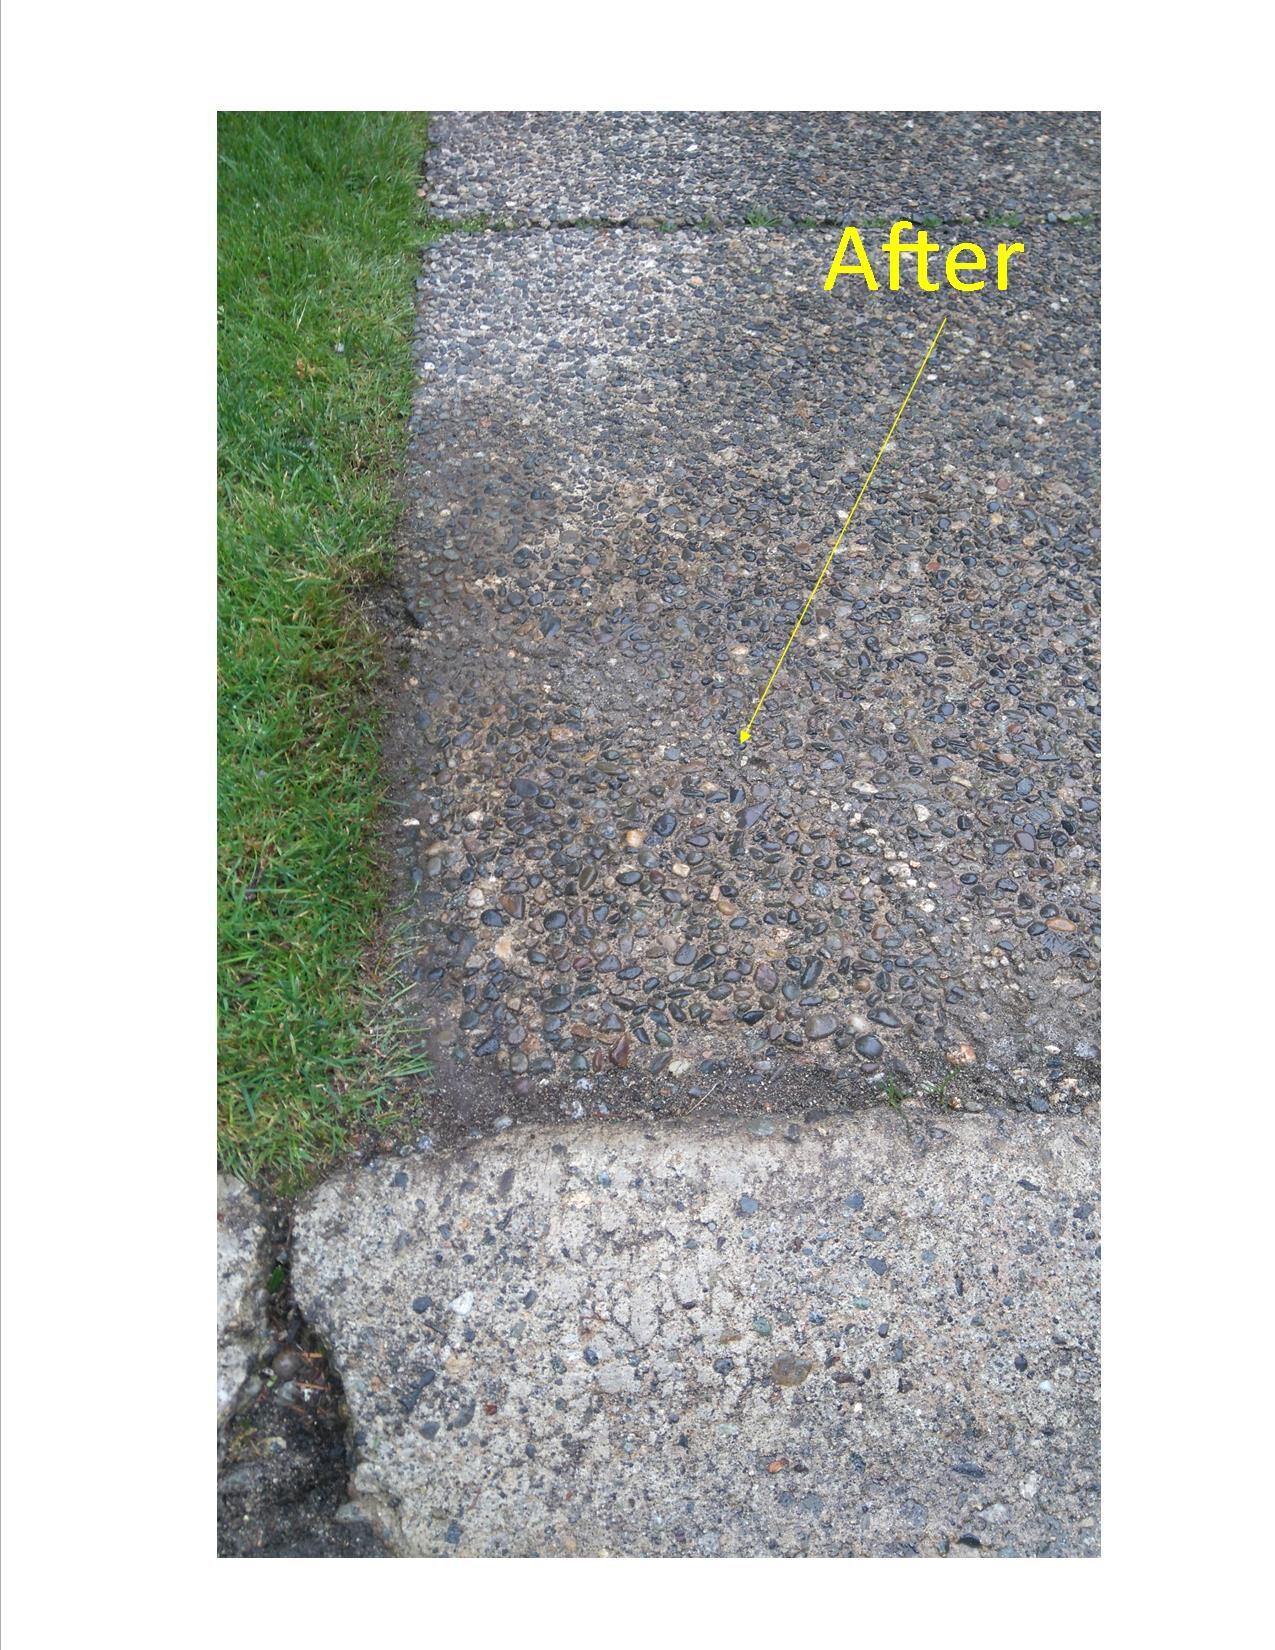 Concrete Crack repair after